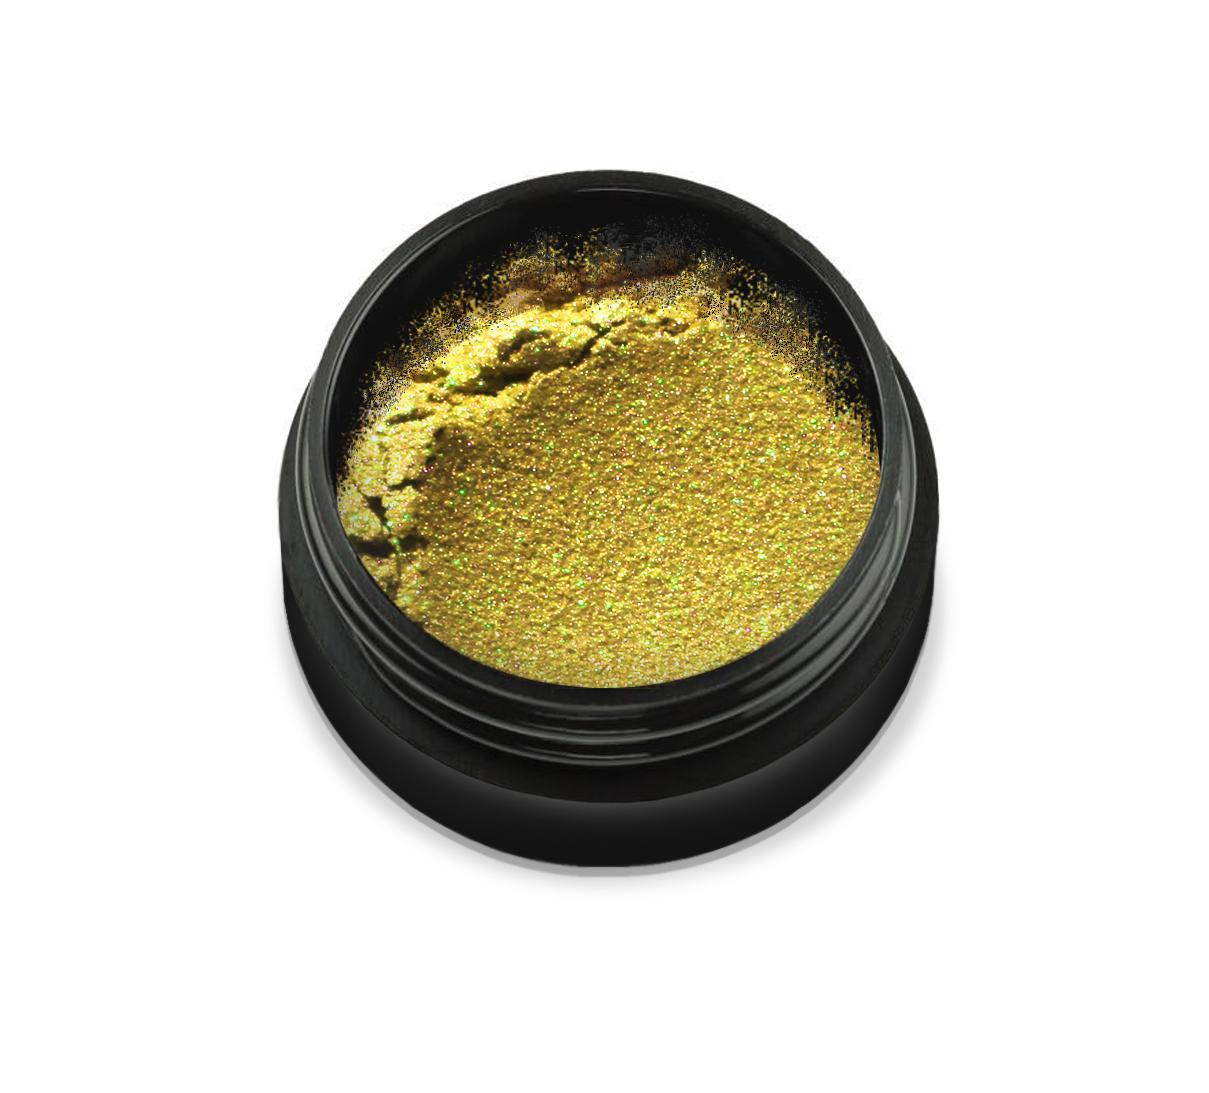 "6111 Pudra cu pigmenti 'Didier Lab"", flash yellow 2,5g/Pigment powder 'Didier Lab"", flash yellow"